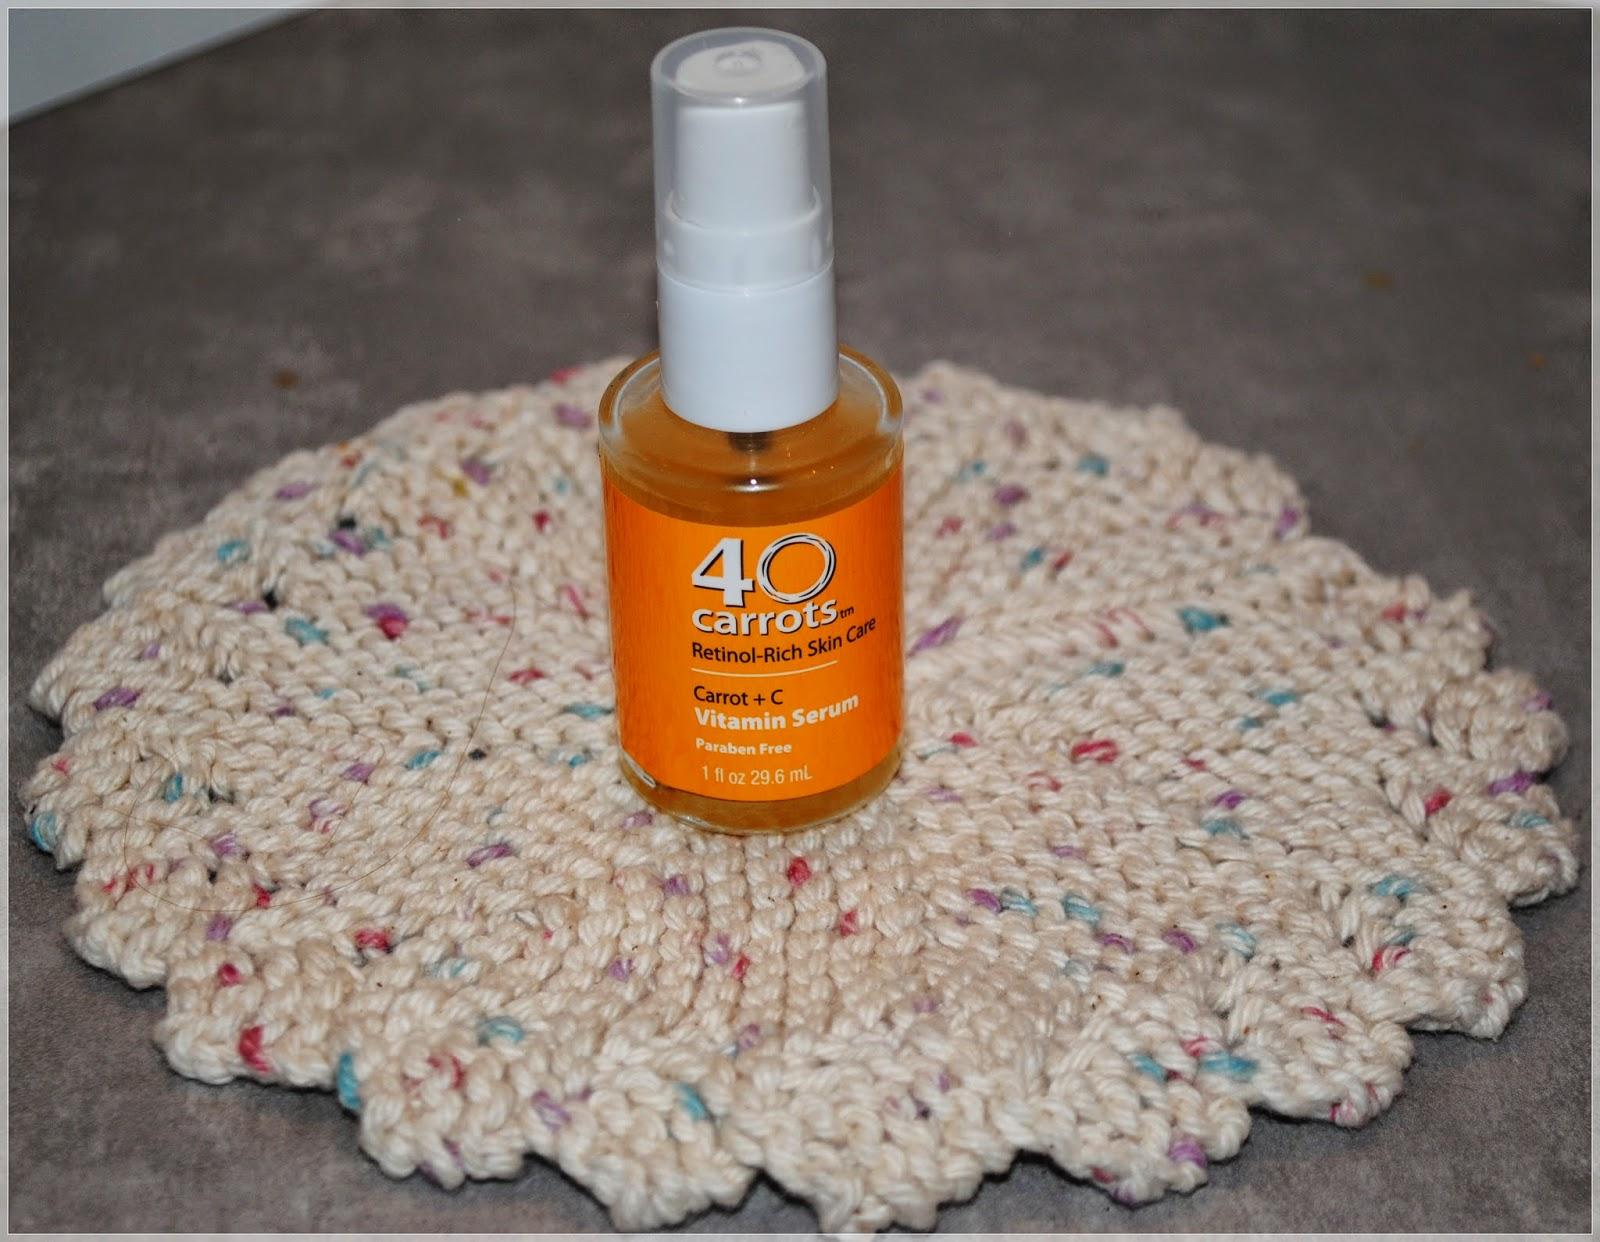 salted caramel style beauty talk 40 carrots vitamin serum